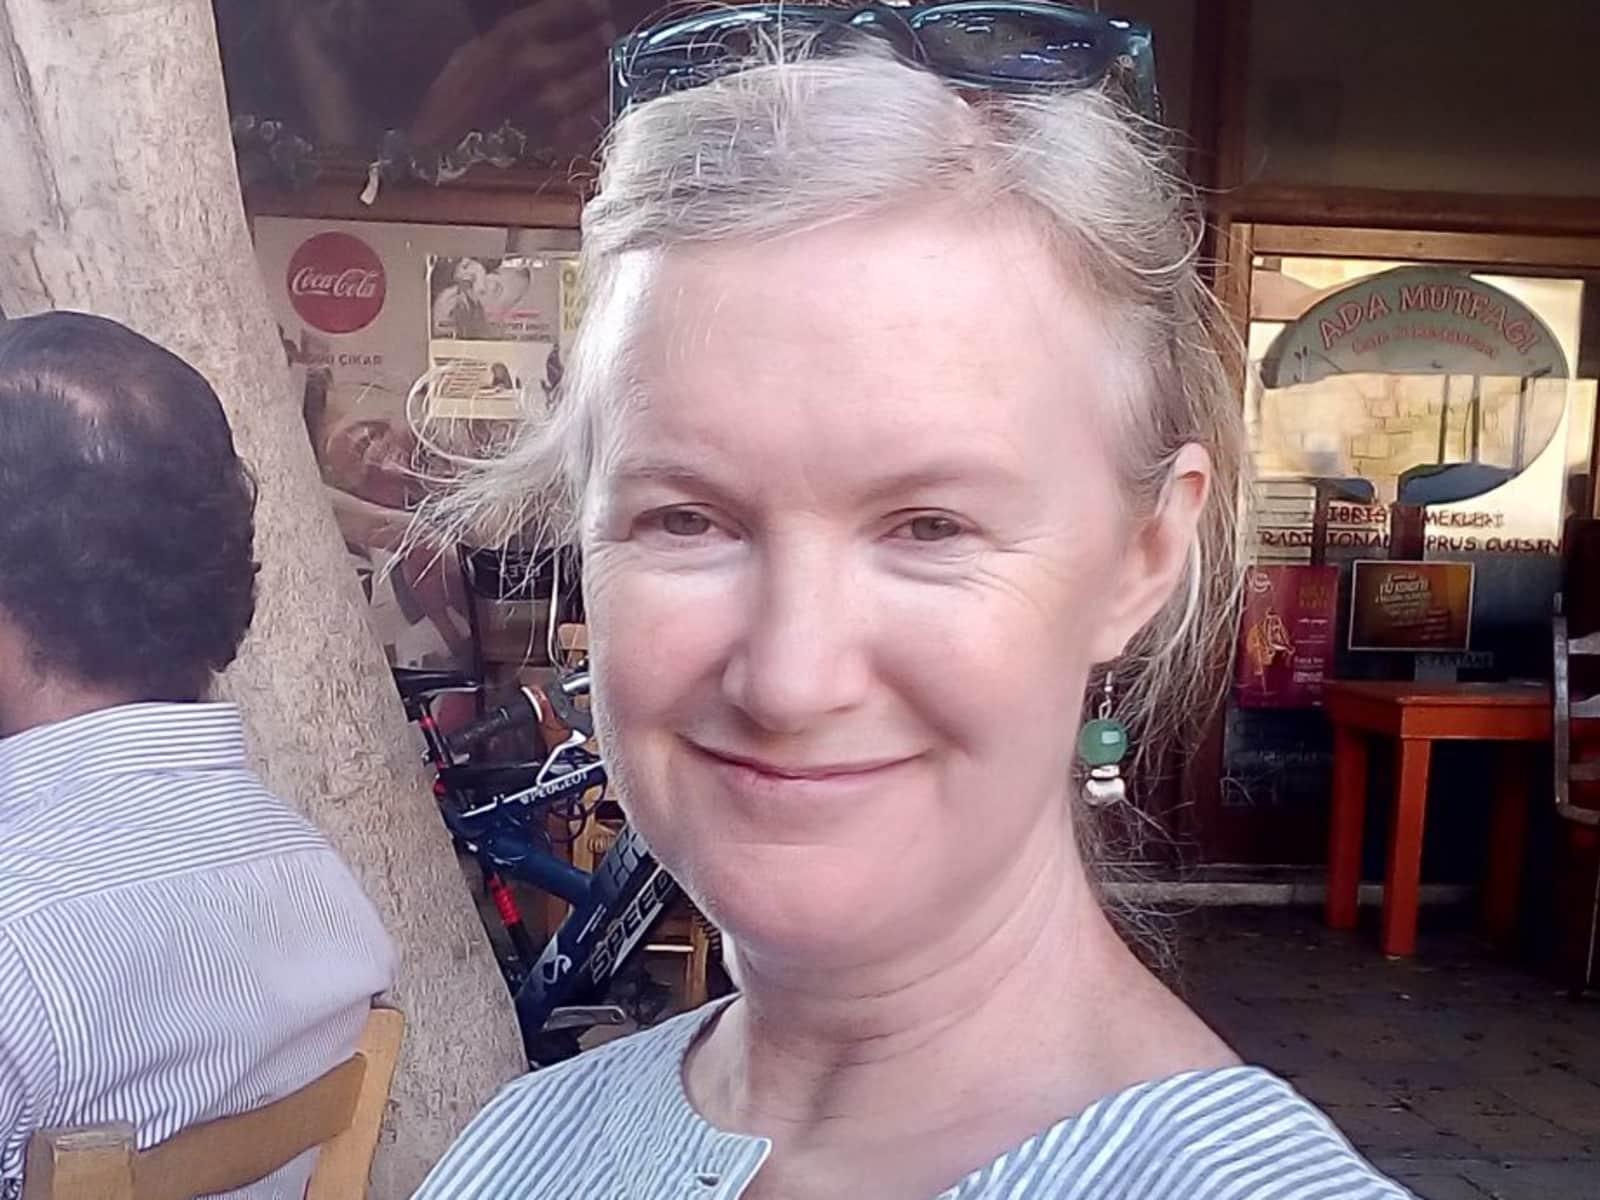 Laura from Nicosia, Cyprus